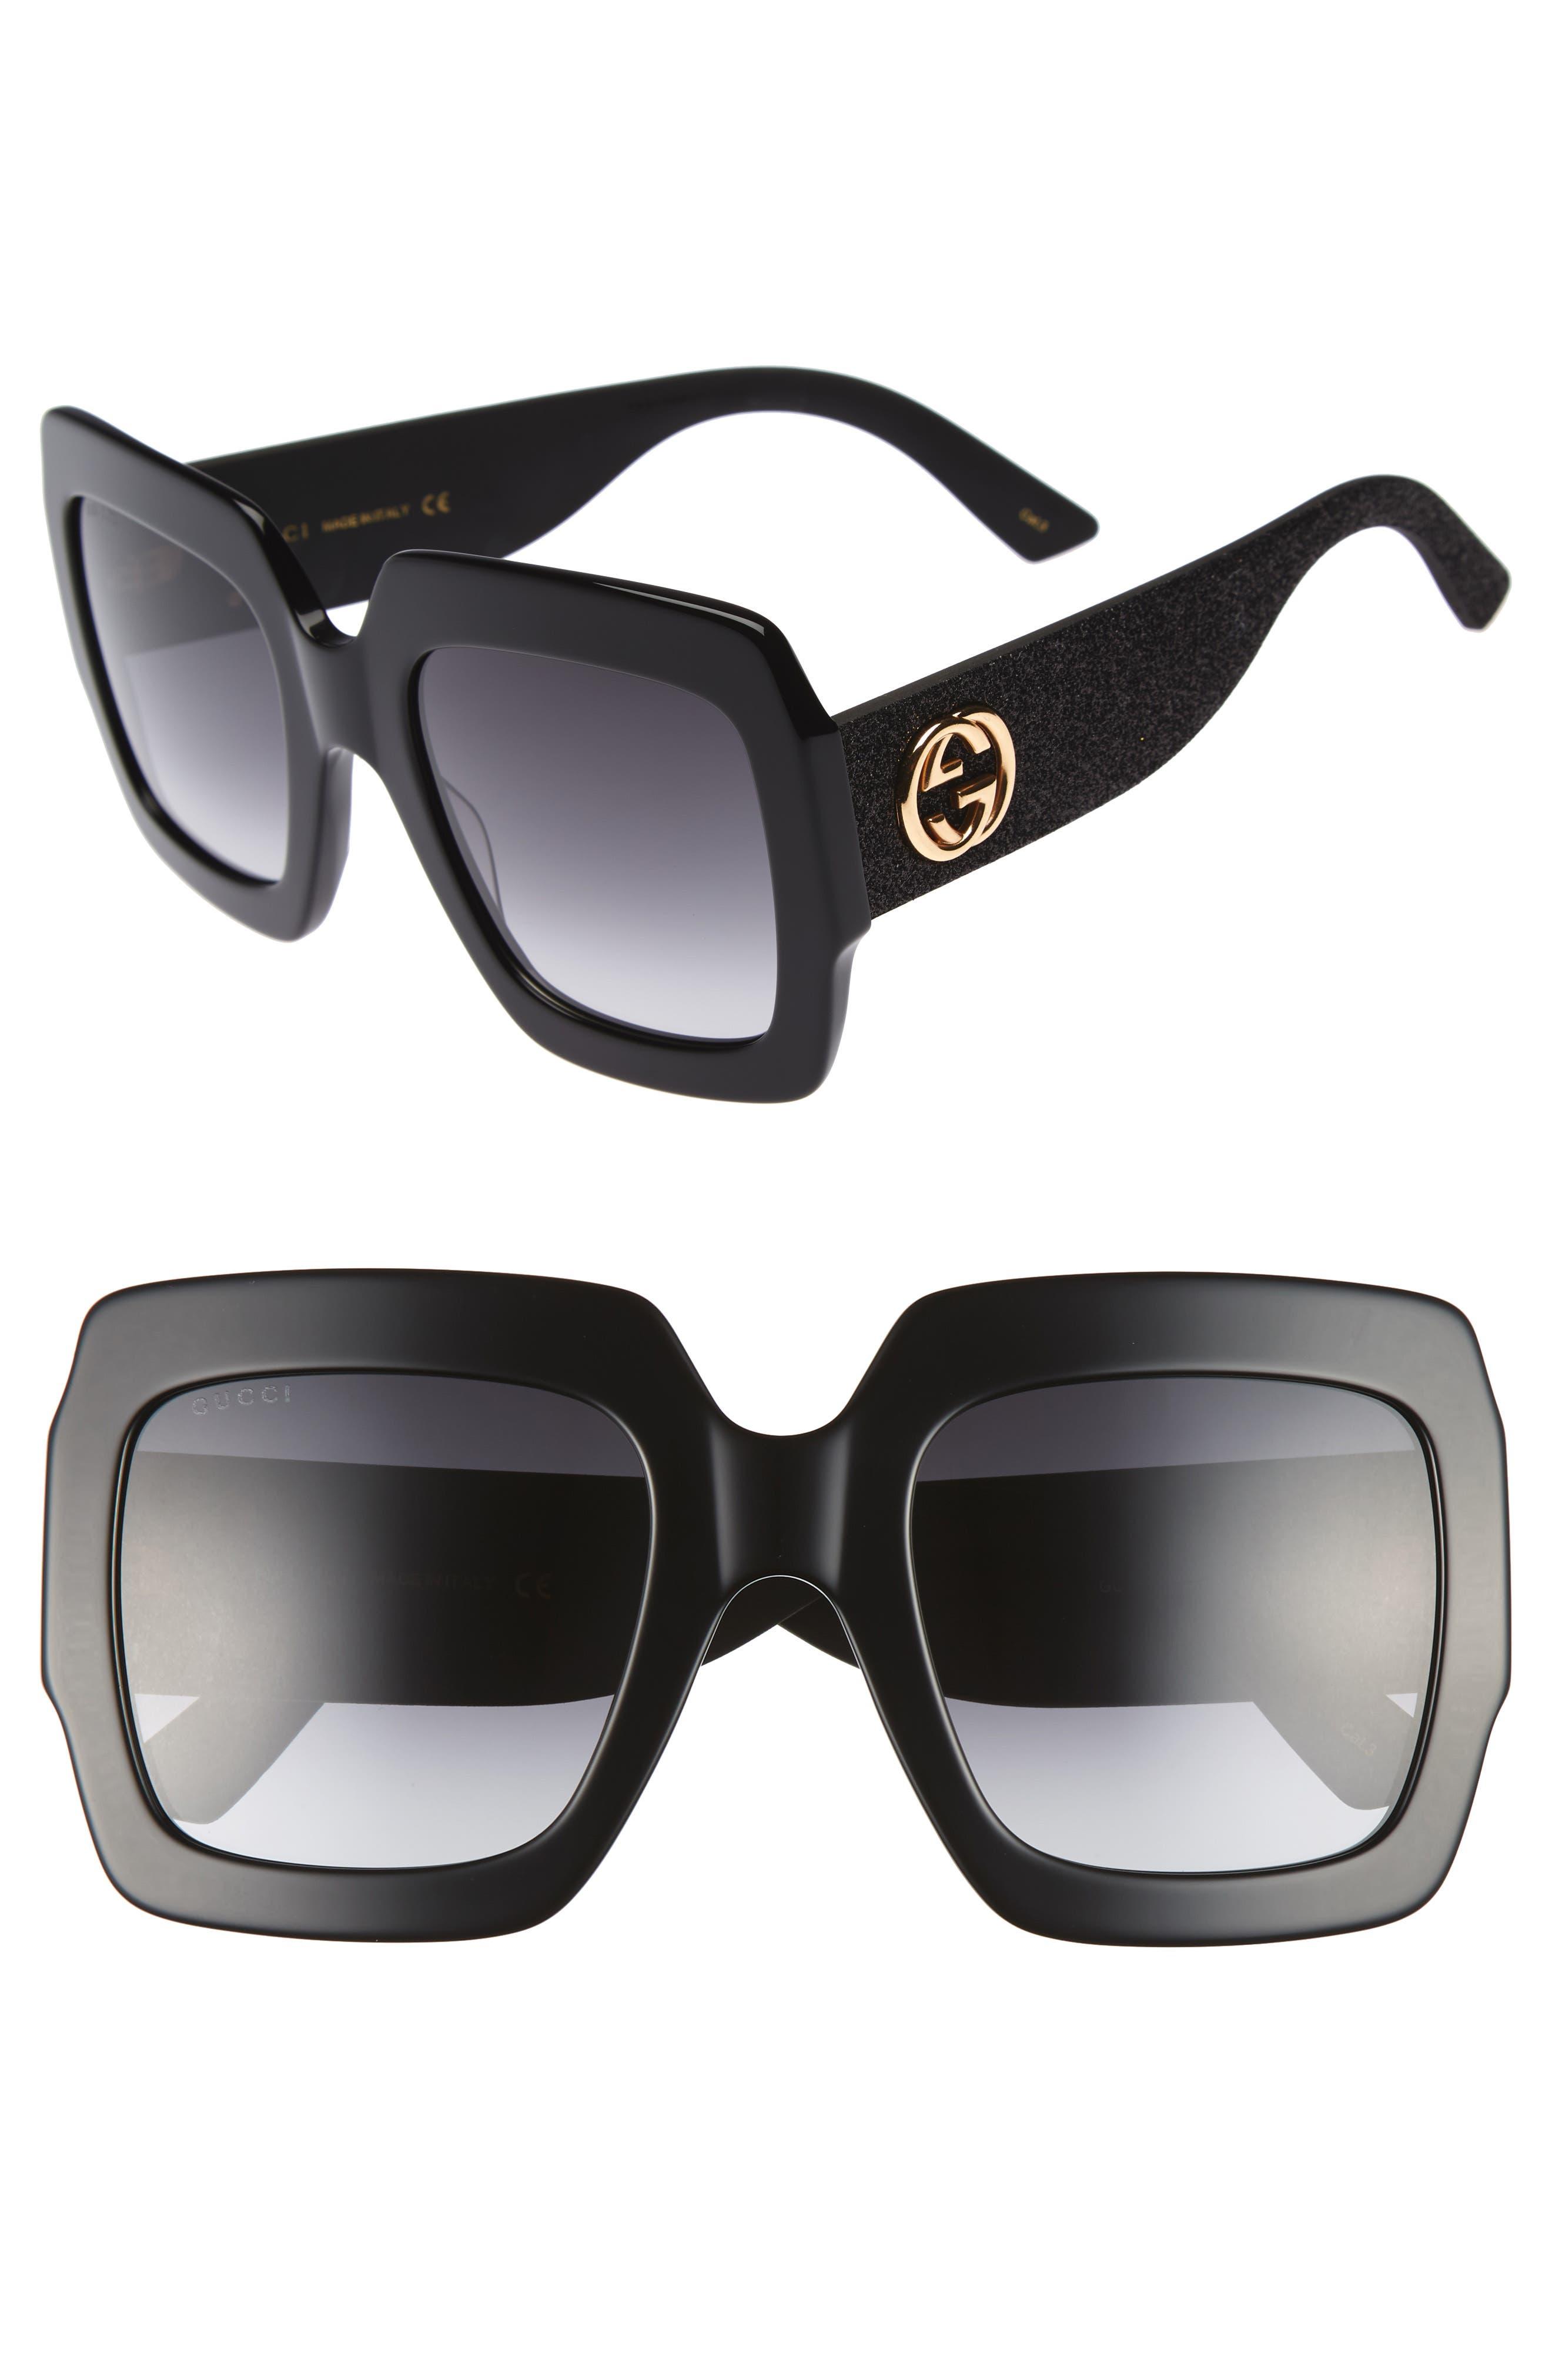 GUCCI, 54mm Square Sunglasses, Main thumbnail 1, color, BLACK/ GREY